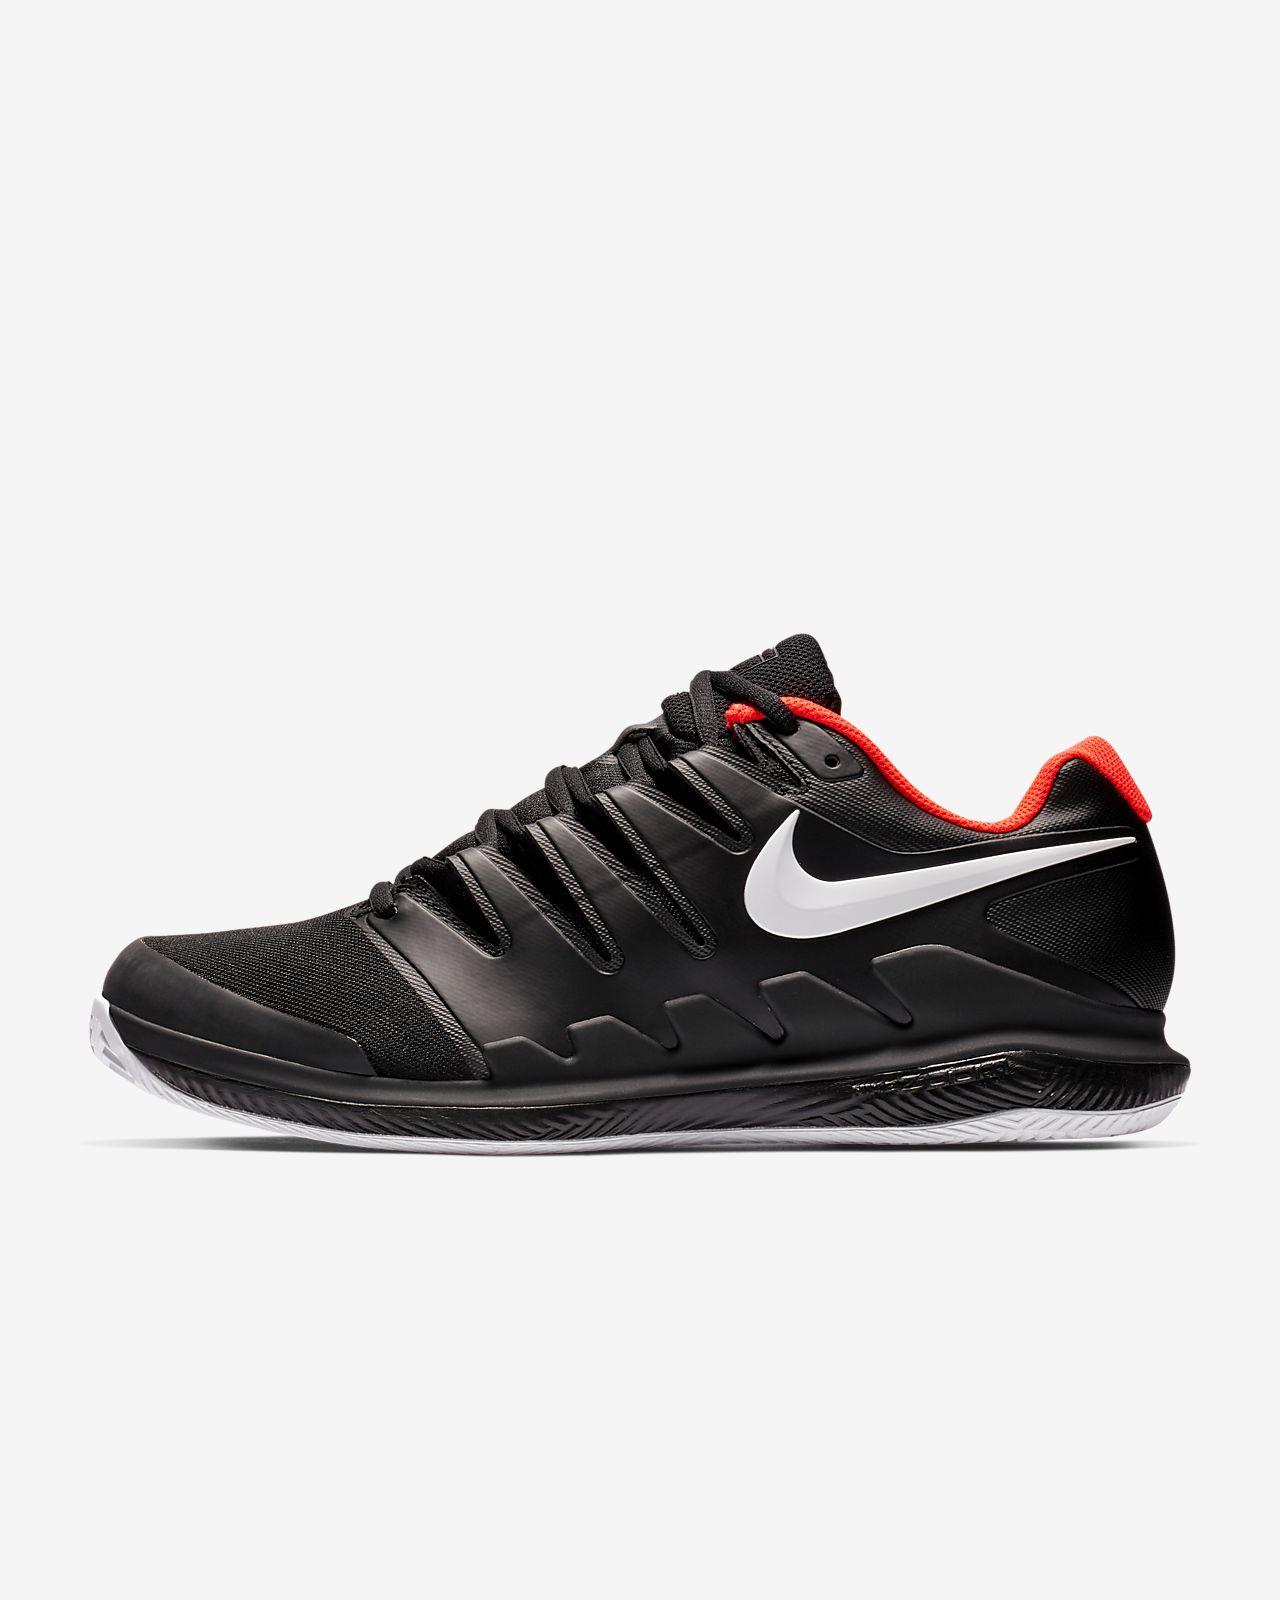 Nike Chaussure Homme Homme Tennis Tennis Tennis Nike Nike Chaussure Chaussure Tennis Chaussure Homme PZiTwXOku